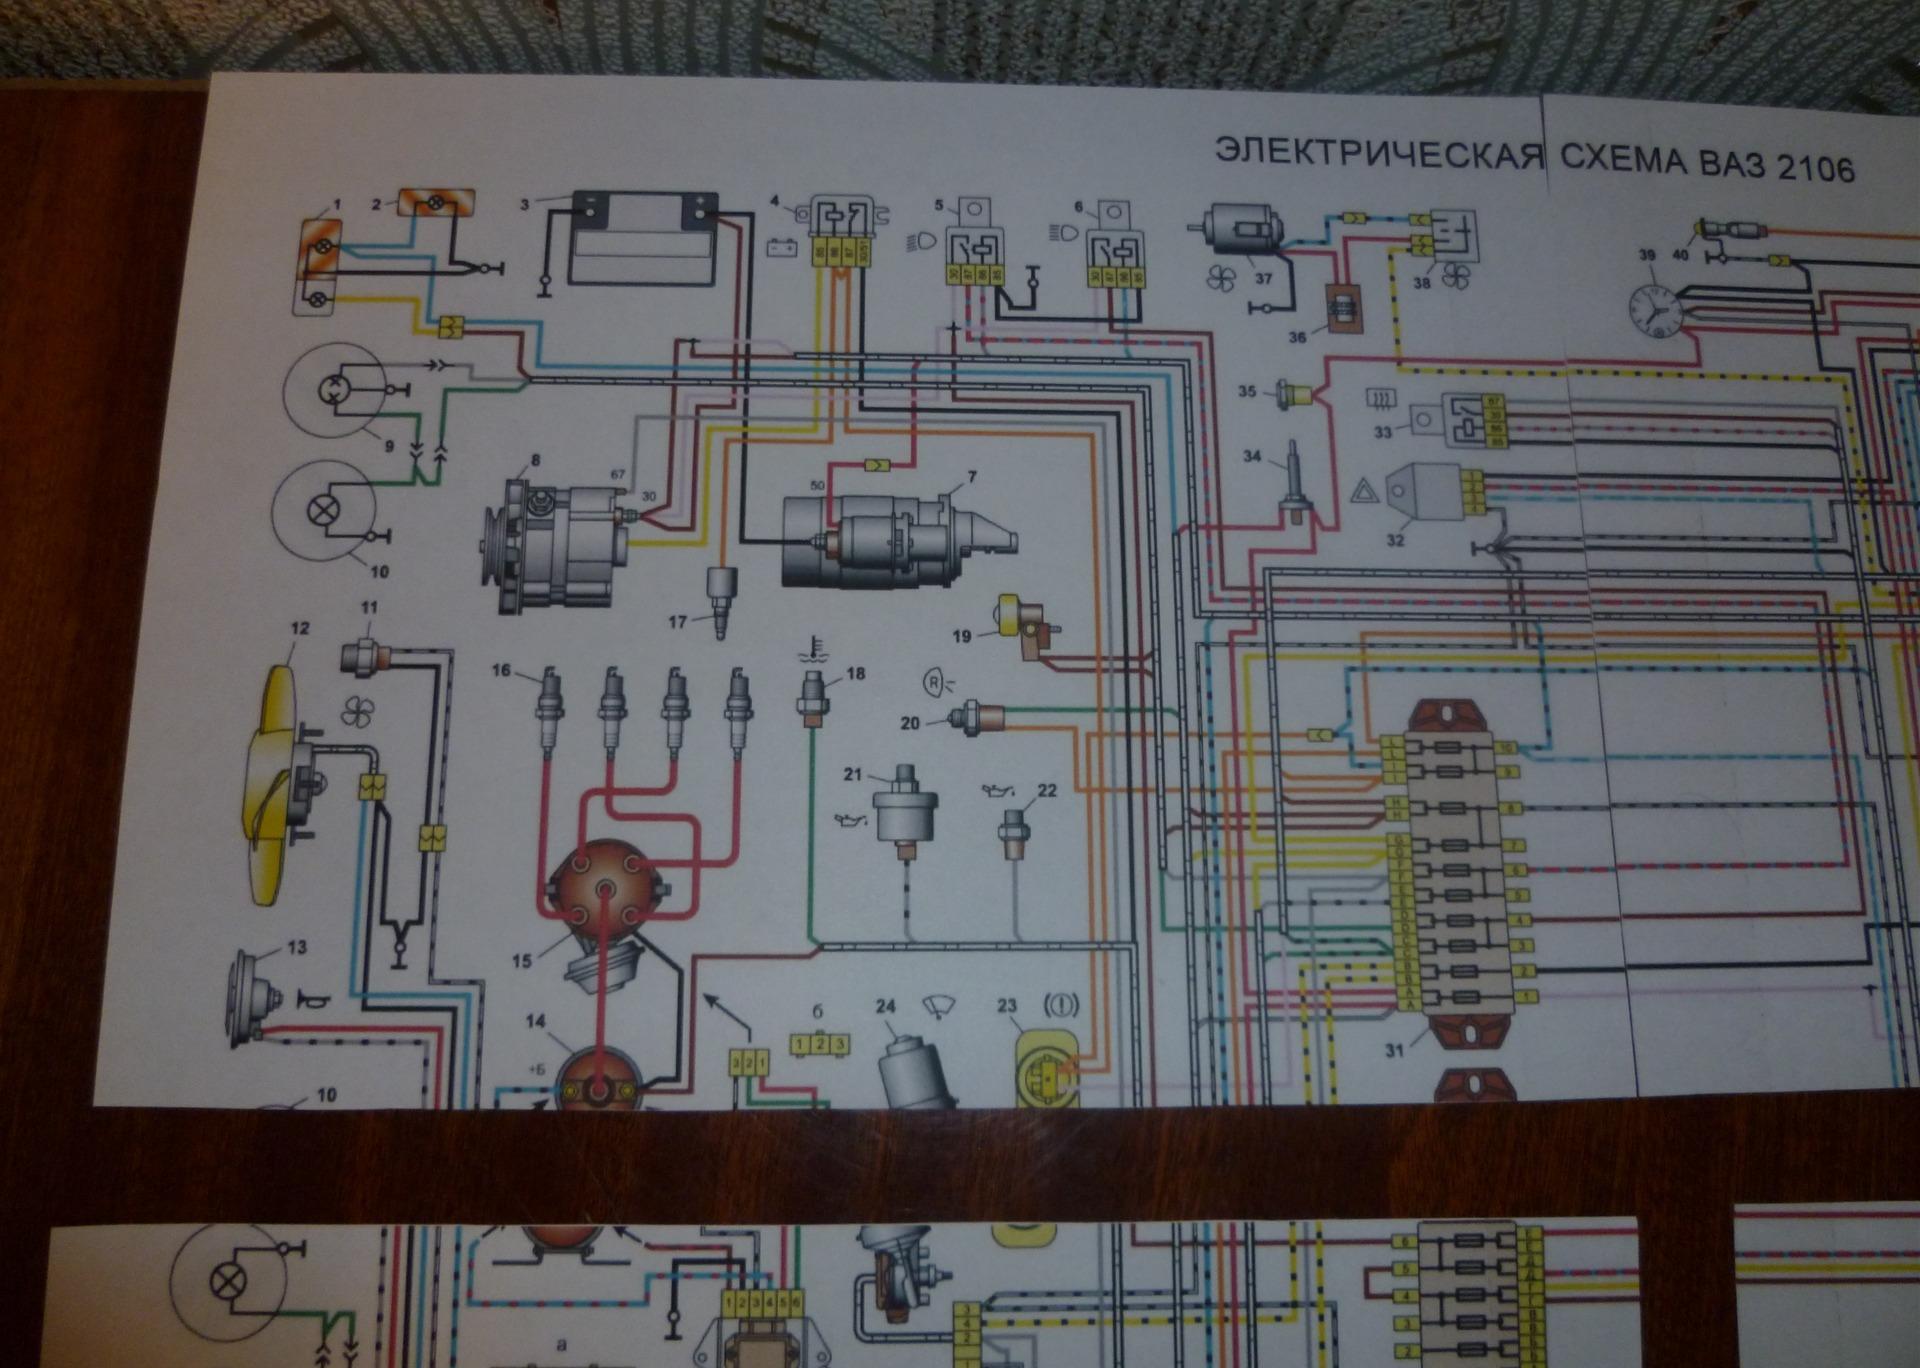 Ремонт электропроводки ваз 2106 своими руками